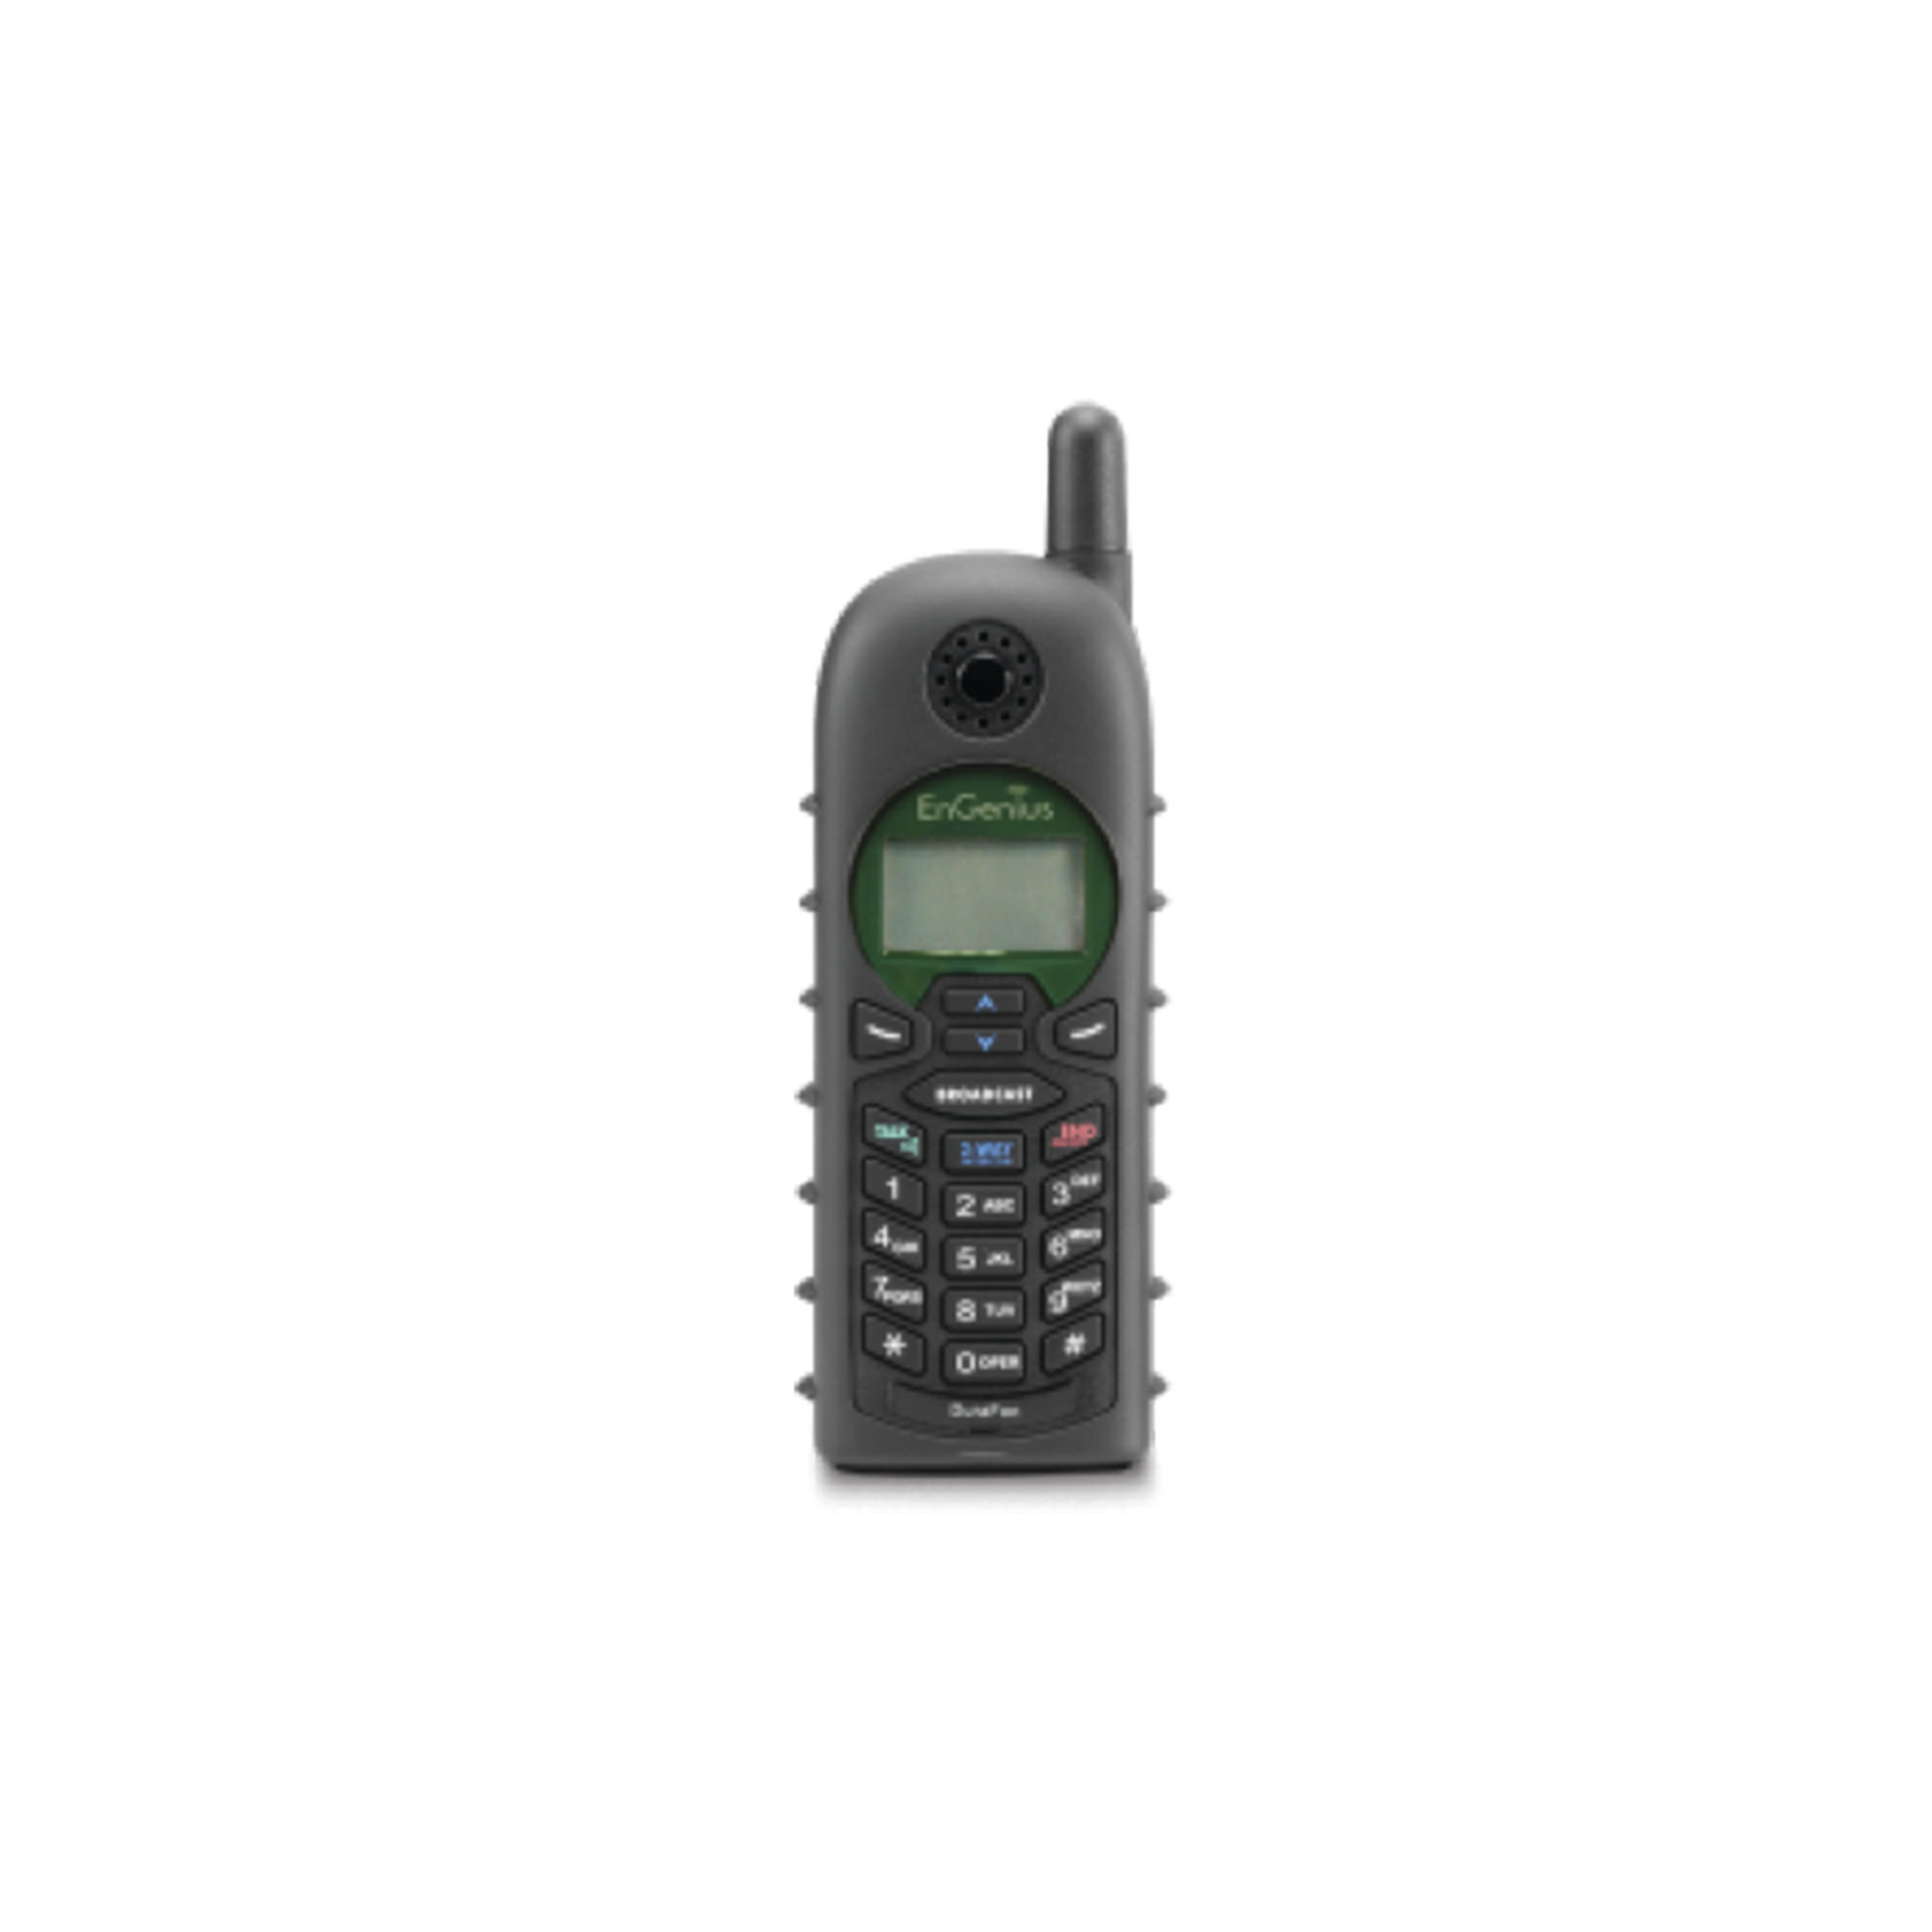 Telefono Inalambrico de Largo Alcance para Expansion con Sistemas DuraFon PRO,PSL,USL, UHF-SYS